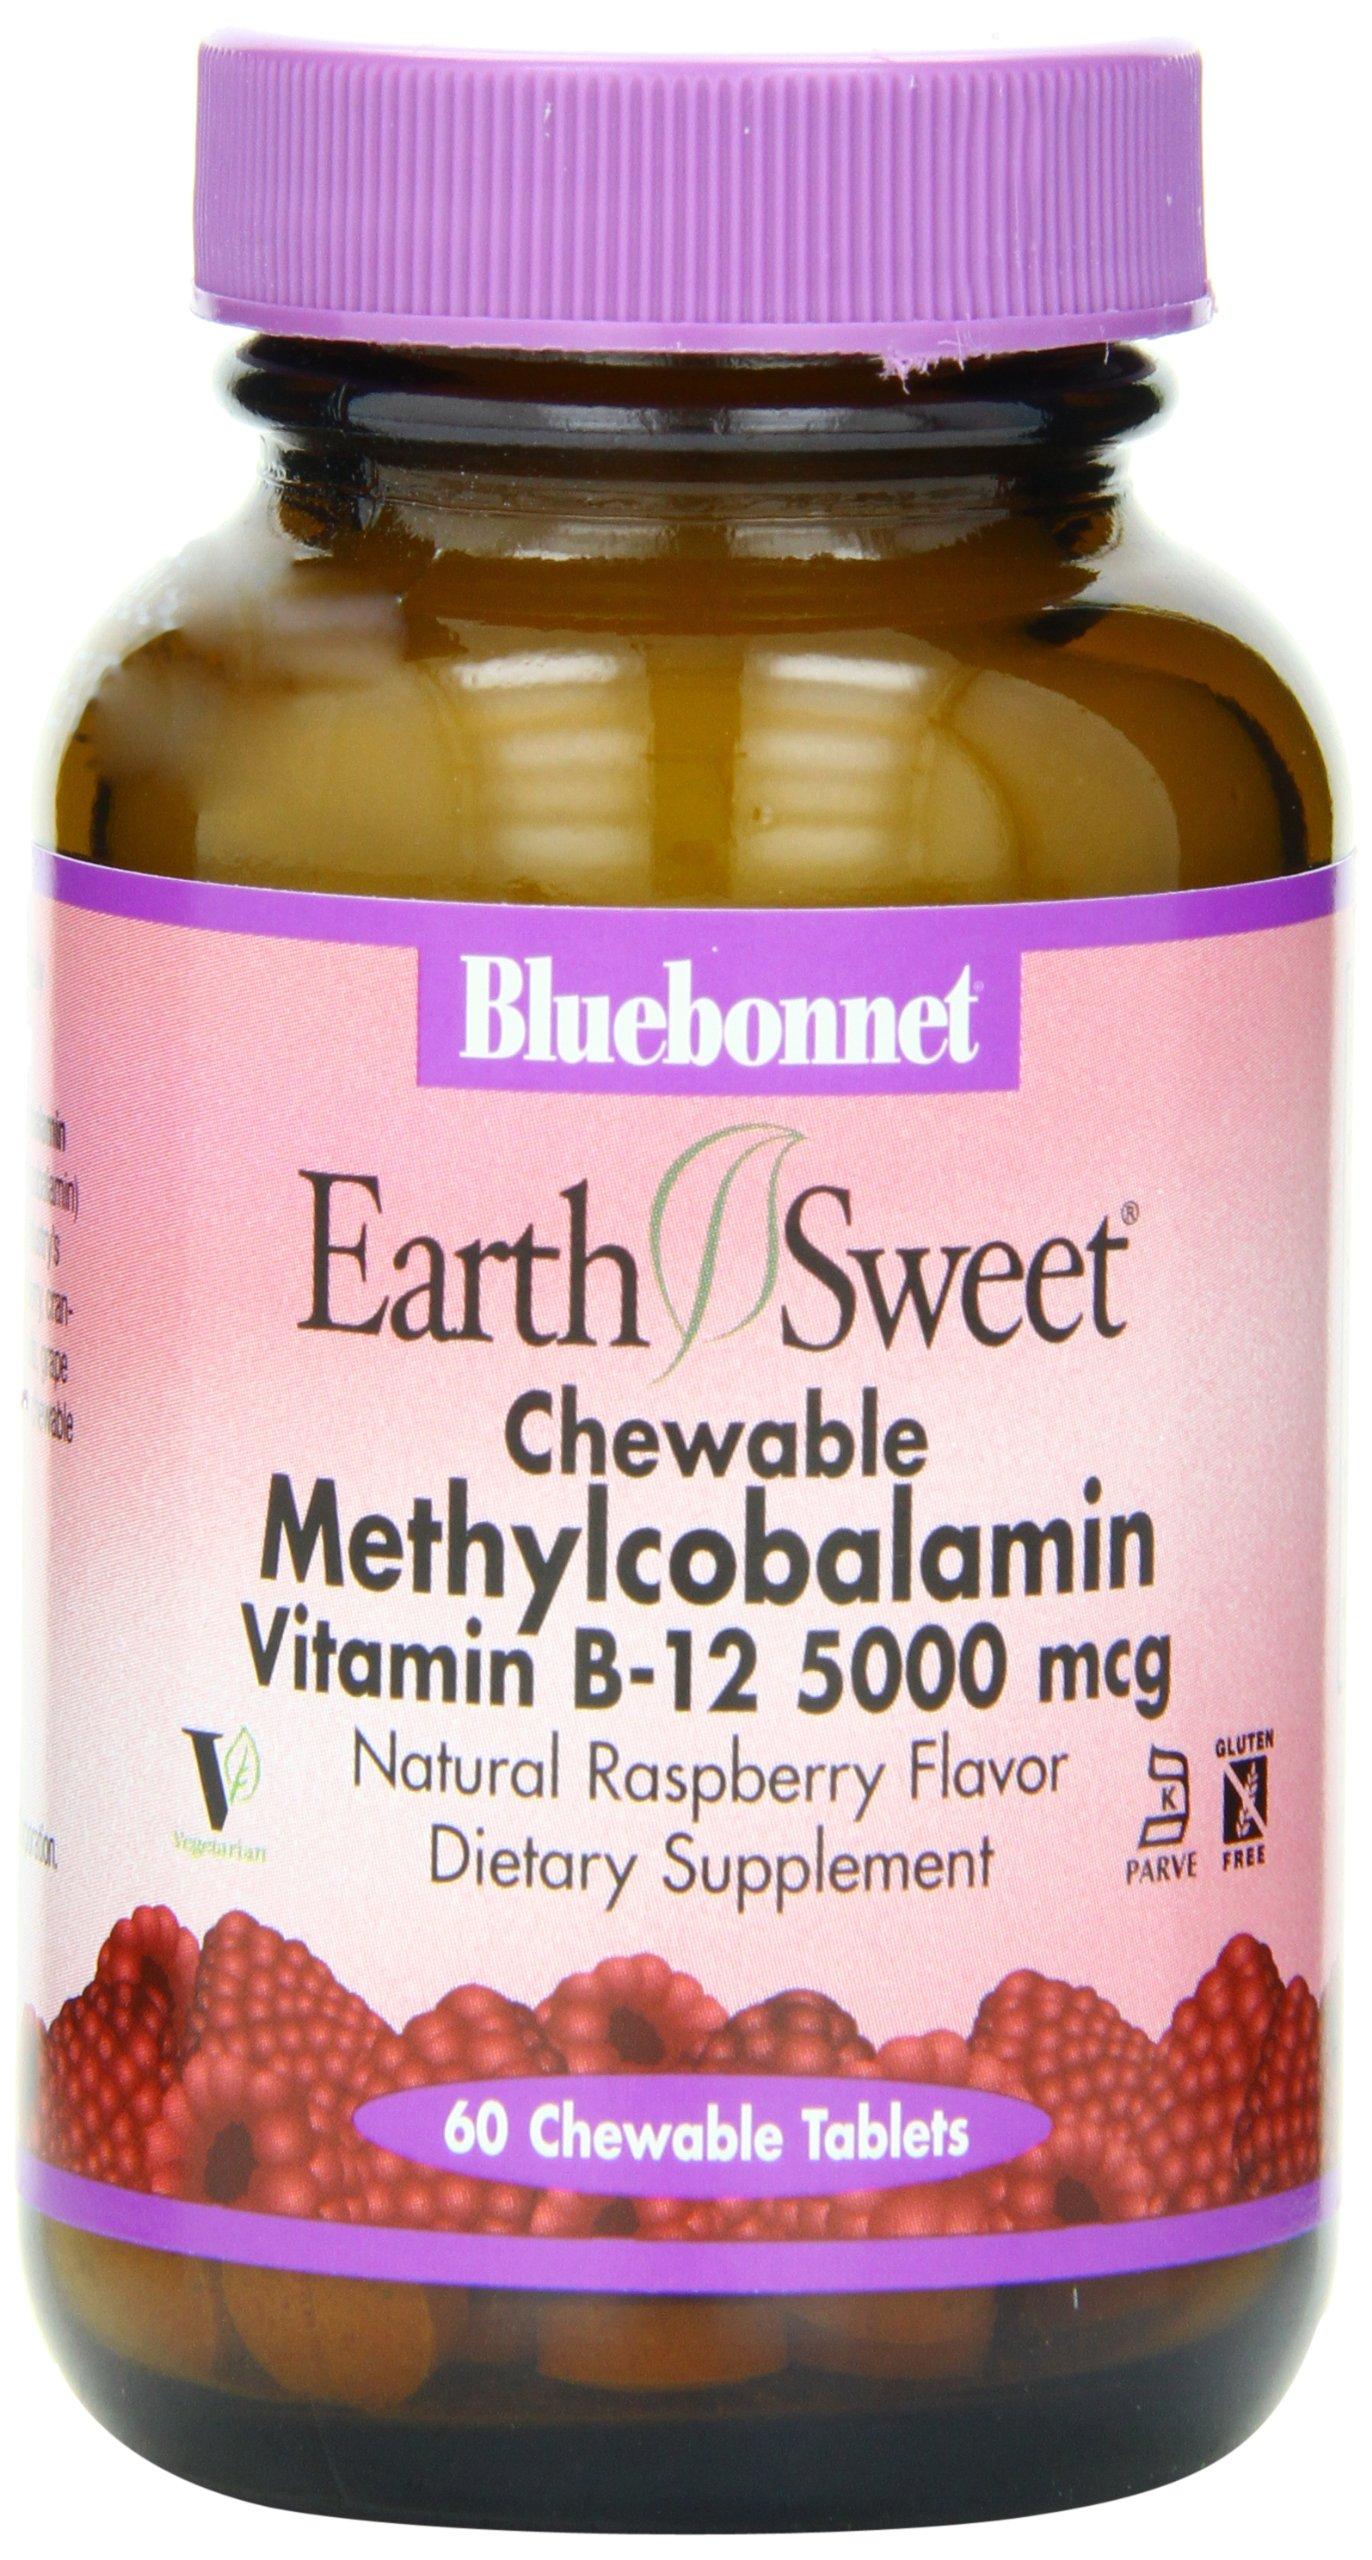 BlueBonnet Methylcobalamin Vitamin B-12 5000 mcg By - 60 Chewable Tablets